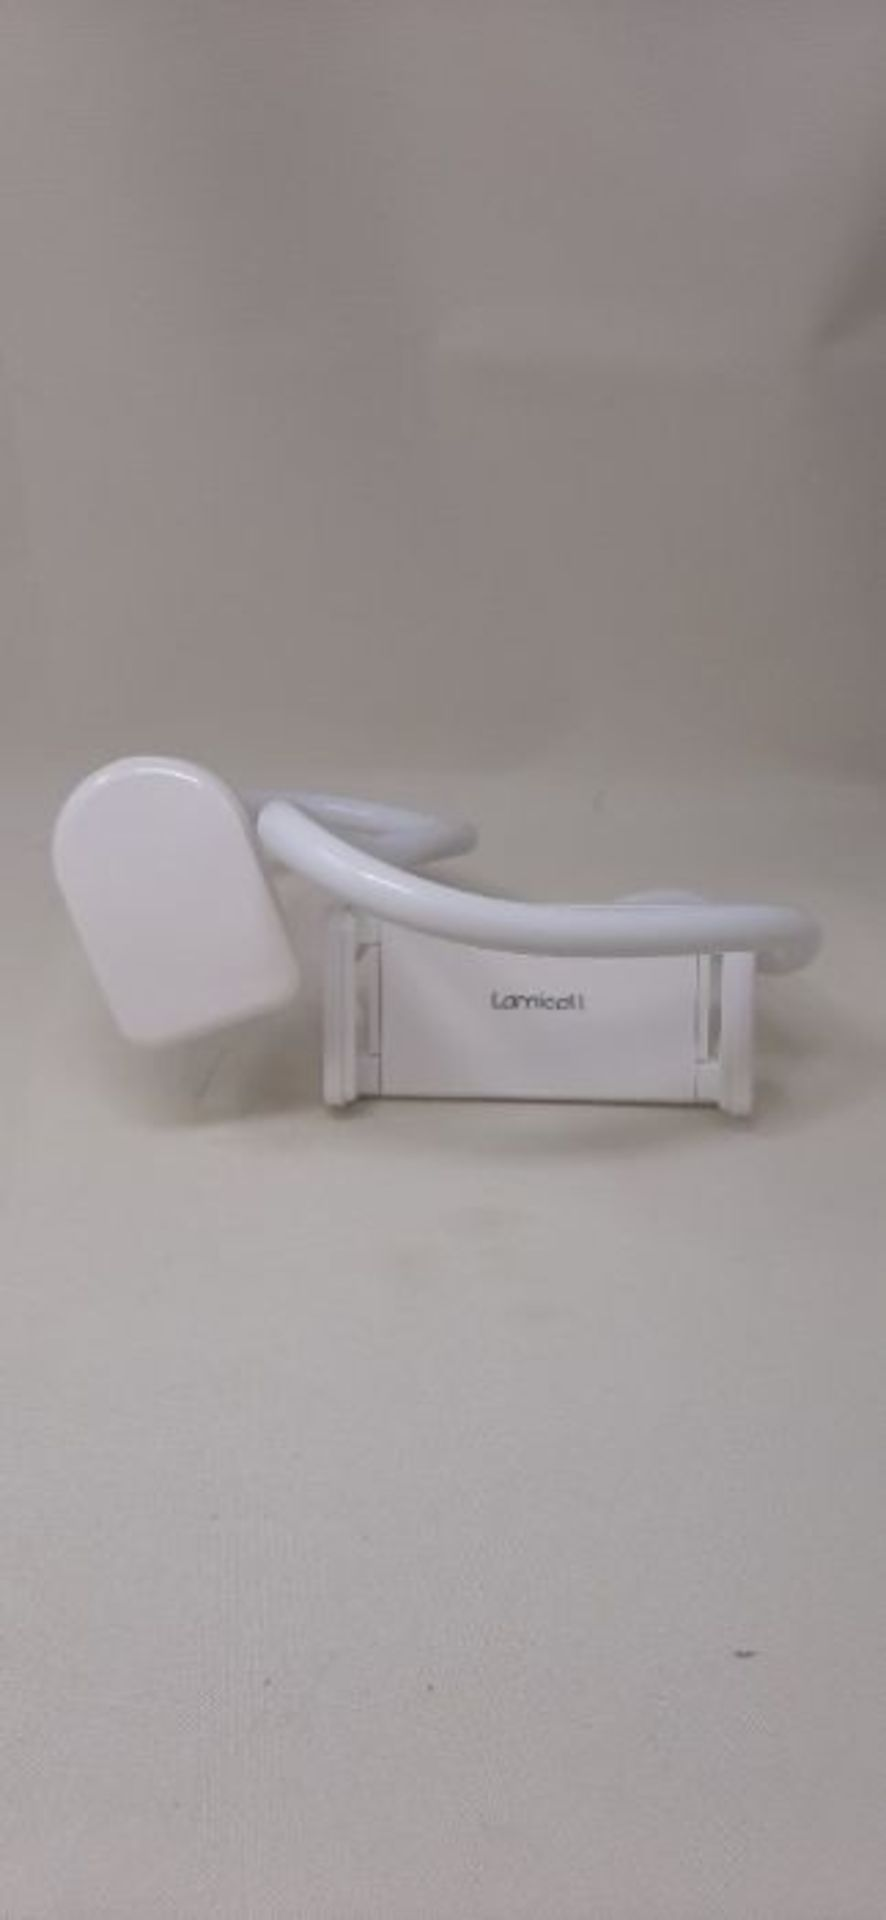 Lamicall Gooseneck Tablet Holder, Flexible Tablet Stand - 360 Adjustable Lazy Arm Hold - Image 2 of 2